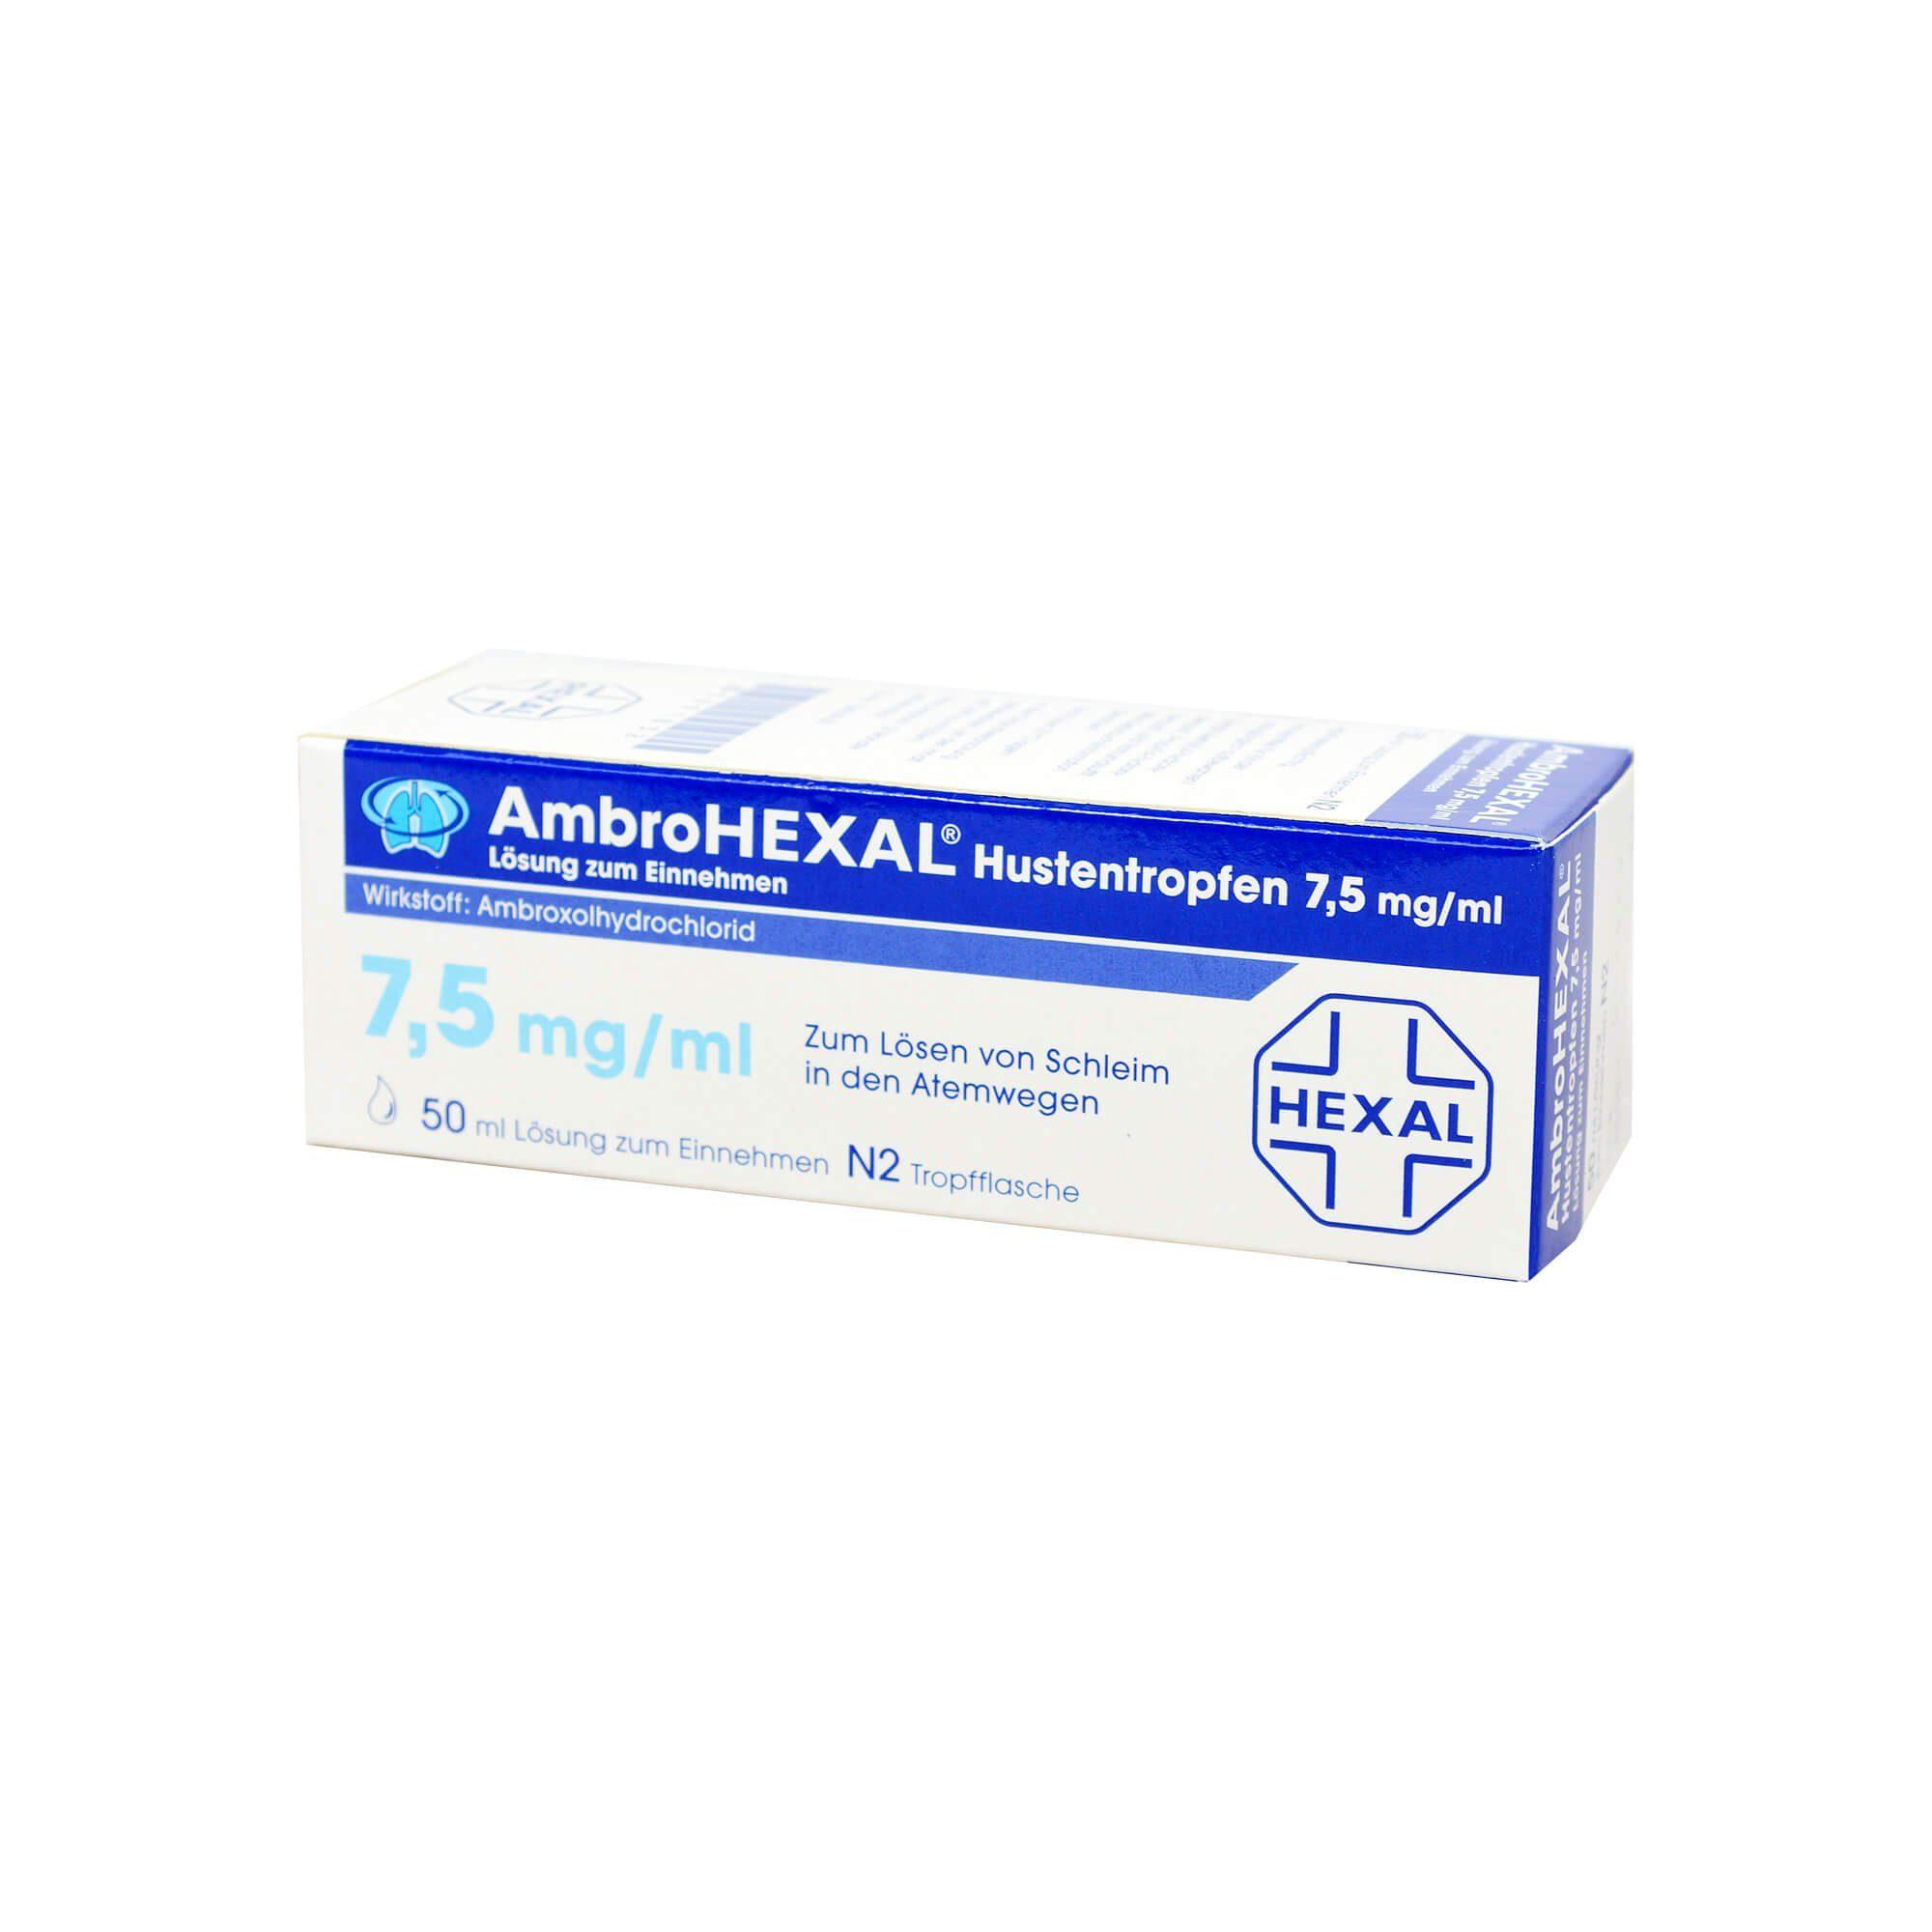 AmbroHEXAL Hustentropfen 7,5 mg/ml (, 50 ml)